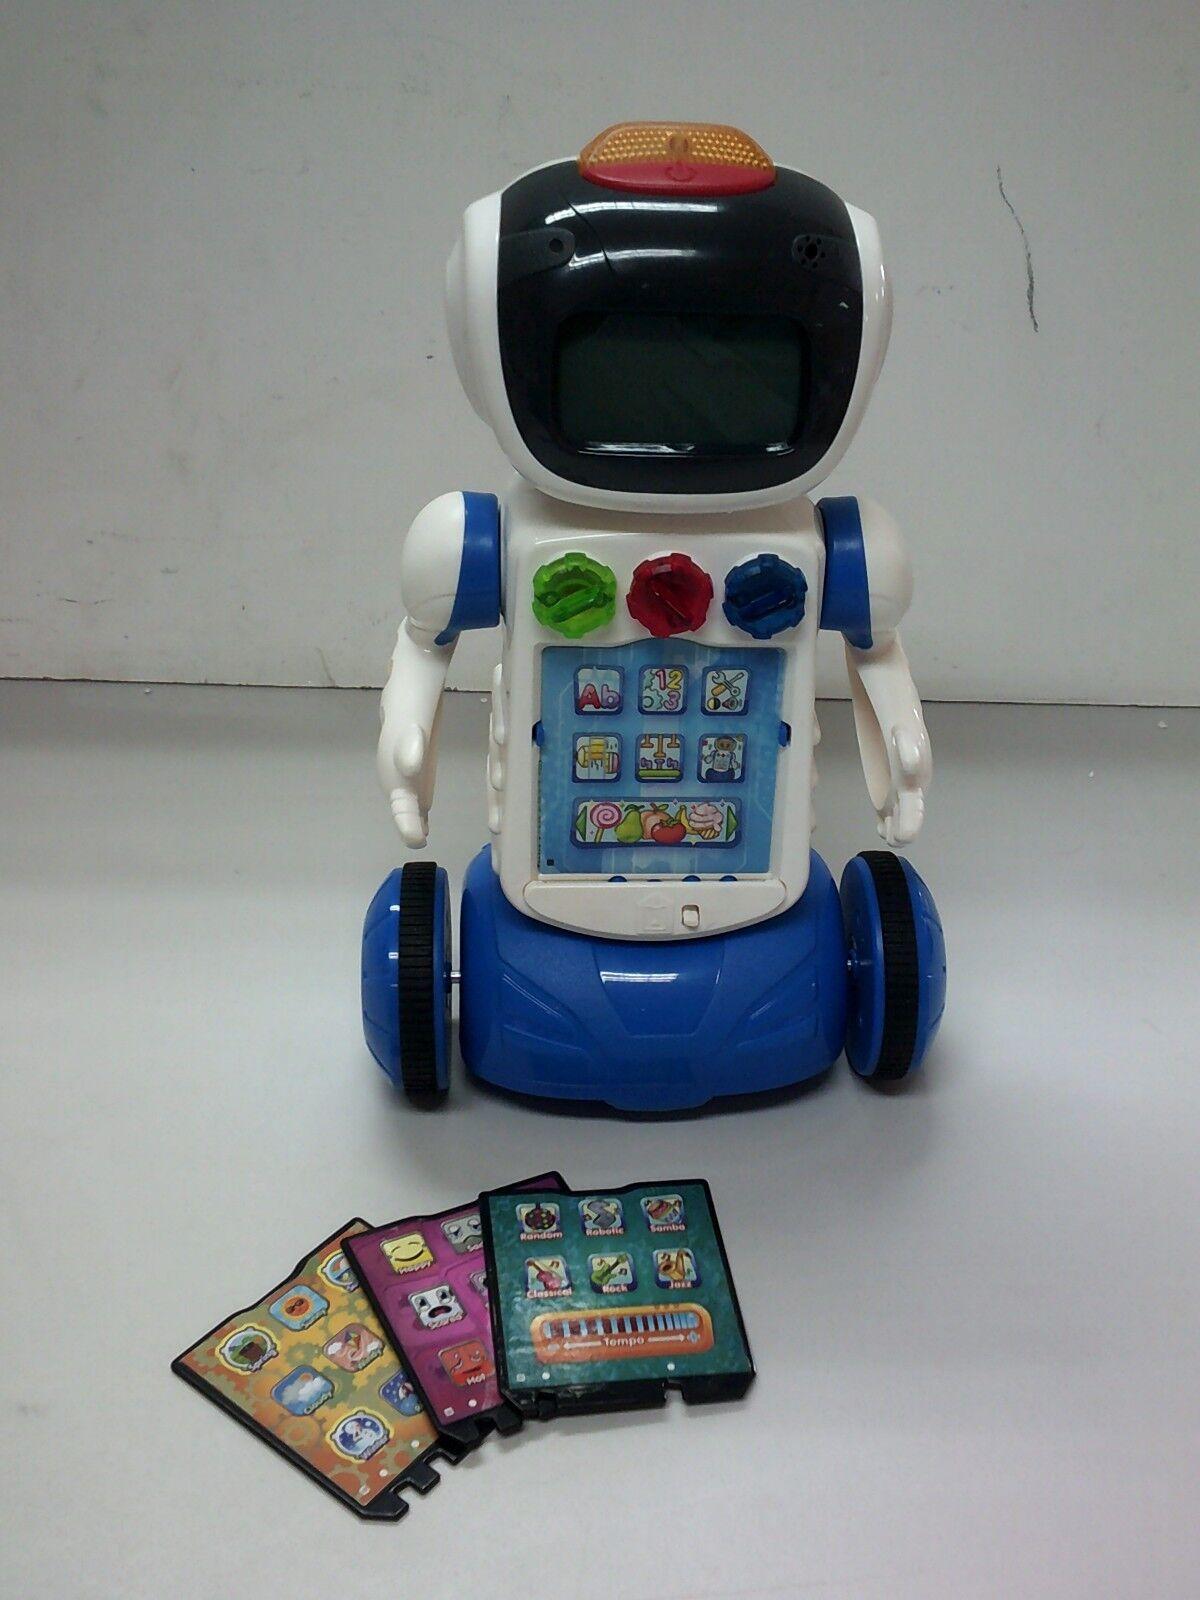 Vtech 182403 Gadget the Learning Robot